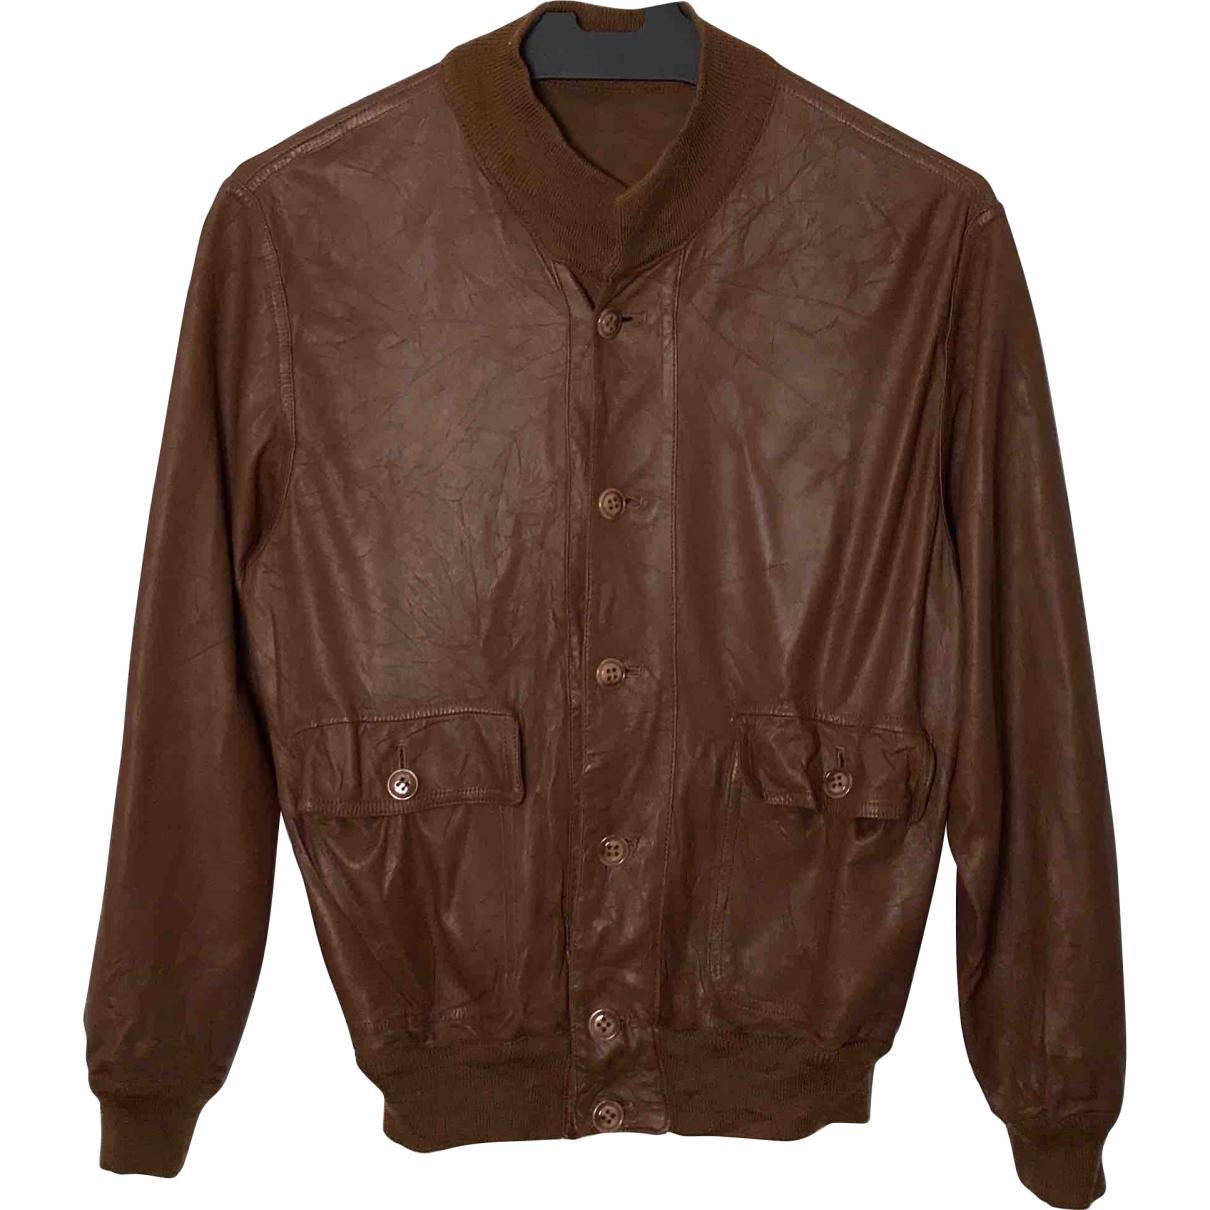 Salvatore Ferragamo \N Brown Leather jacket  for Men 48 IT